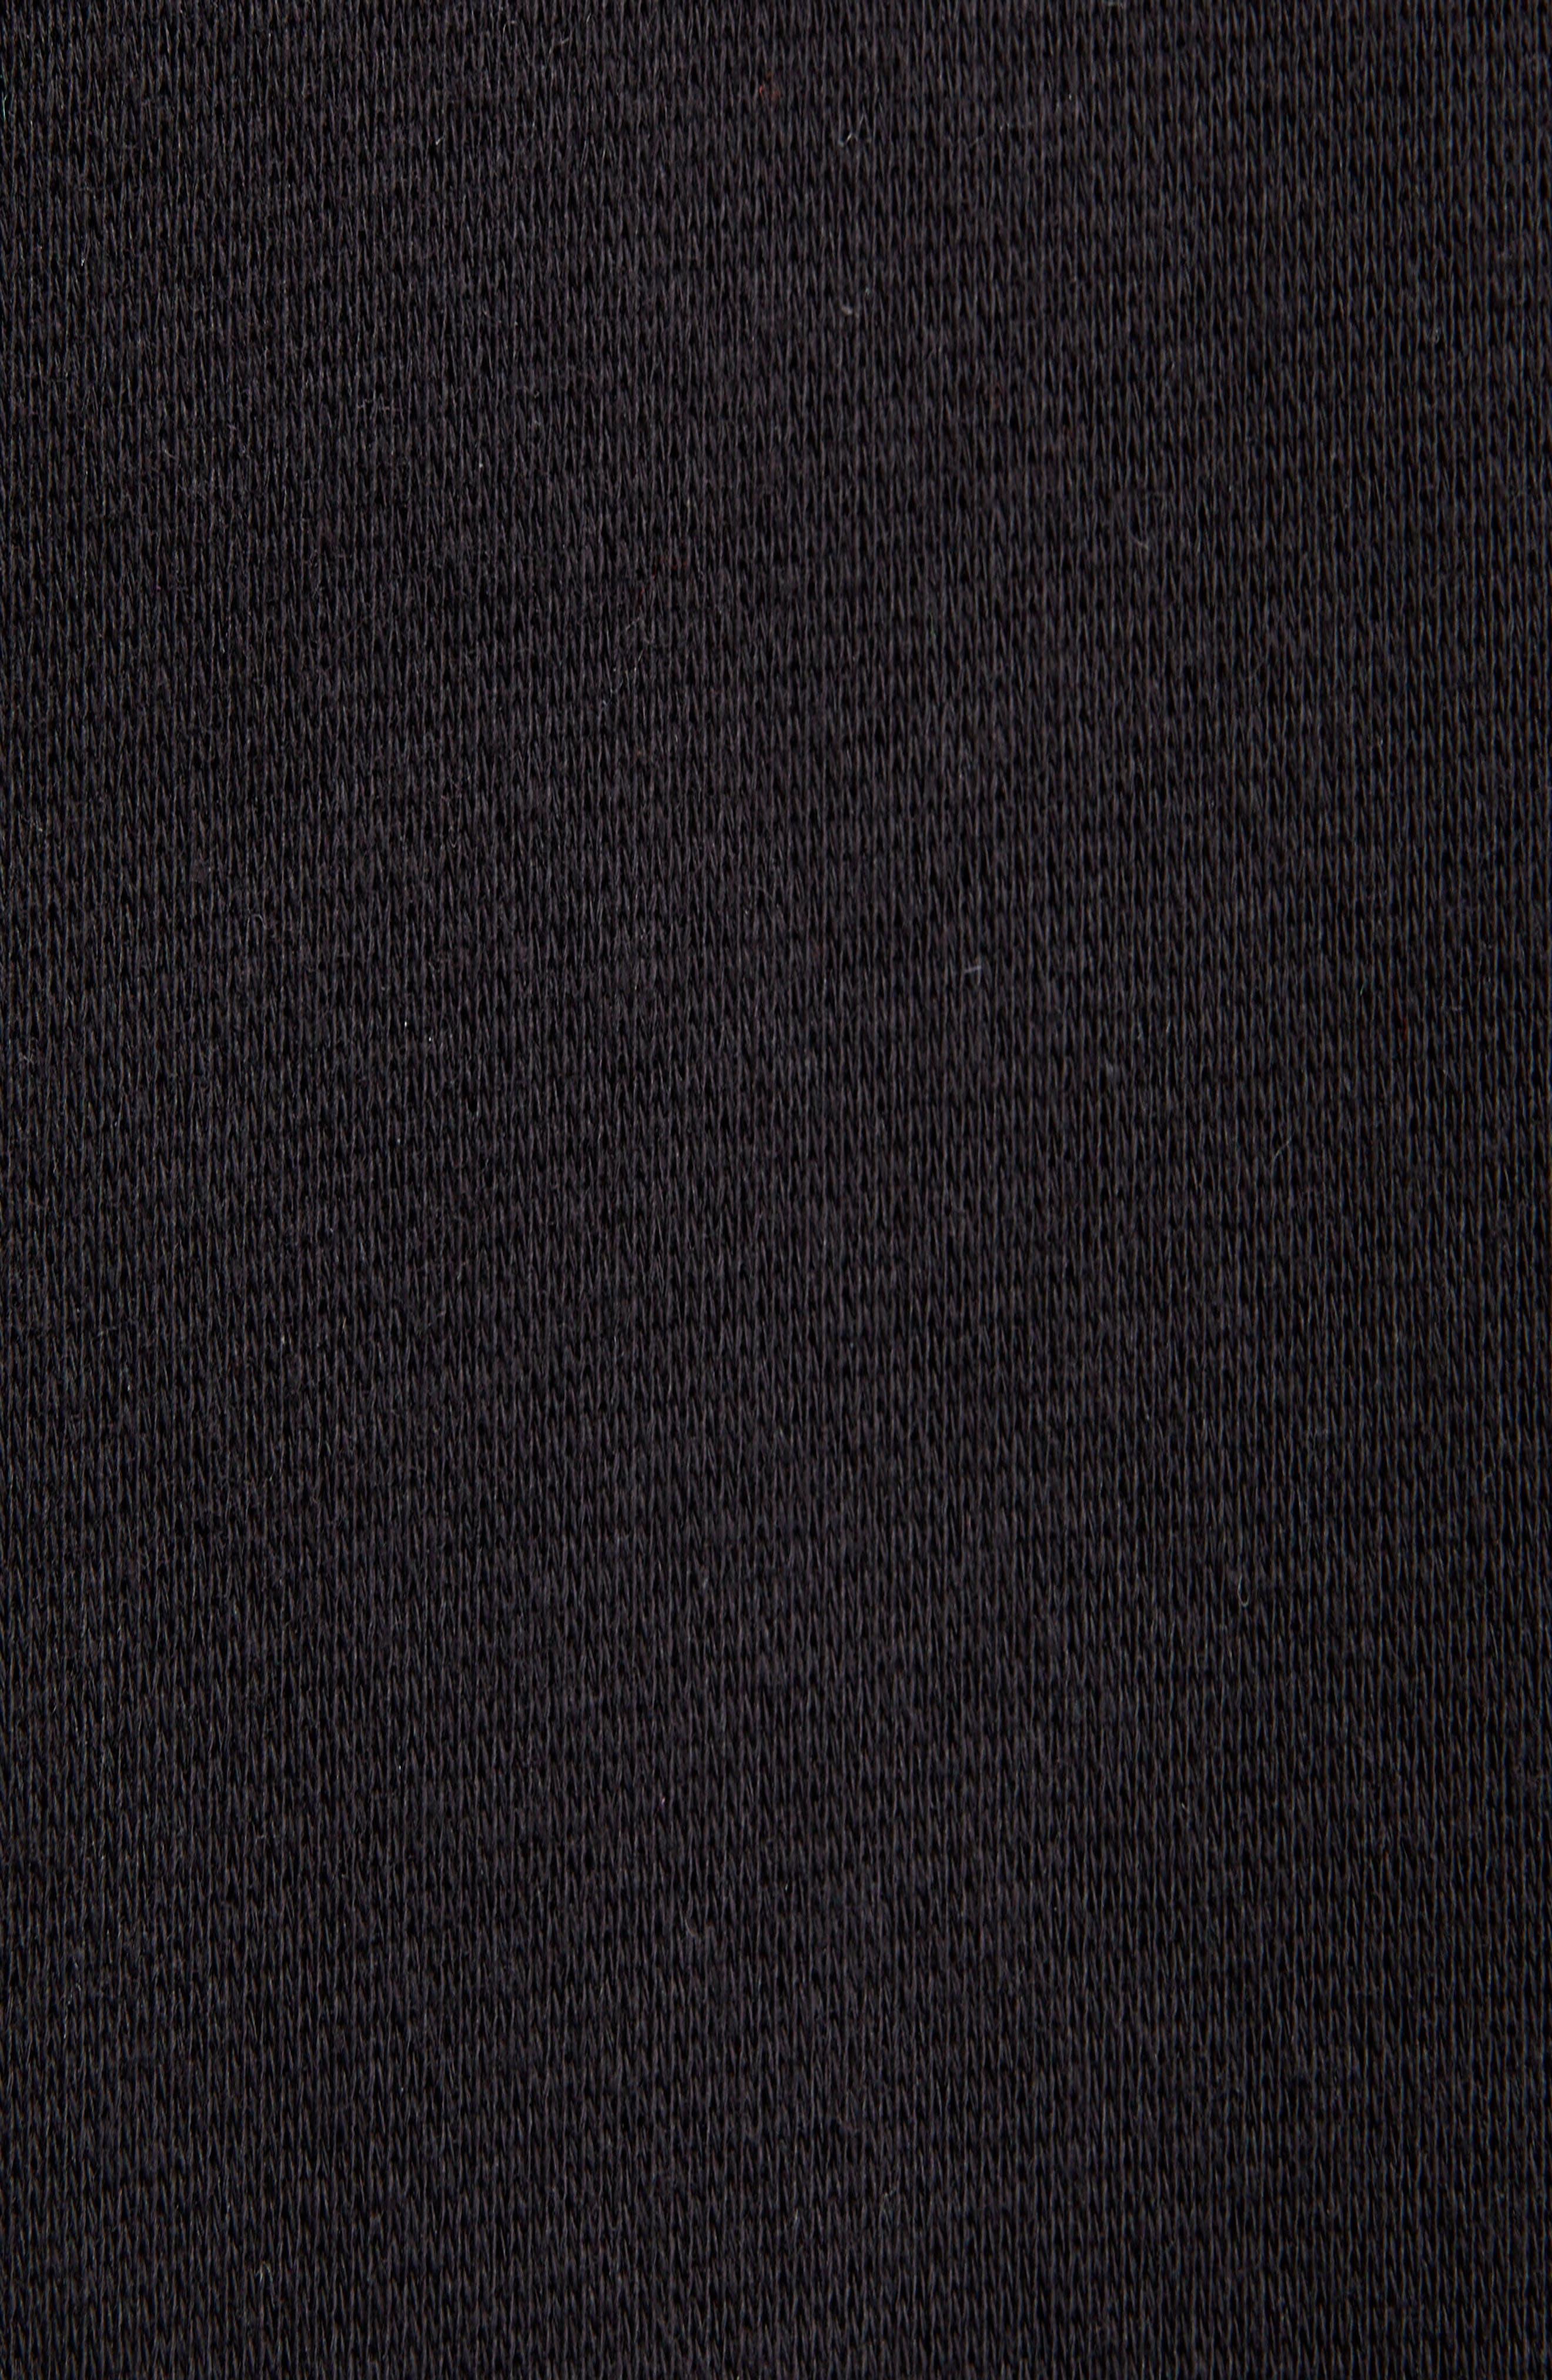 World Food Programme Oversize Brushed Felt Hoodie,                             Alternate thumbnail 5, color,                             1070-BLACK/ WHITE